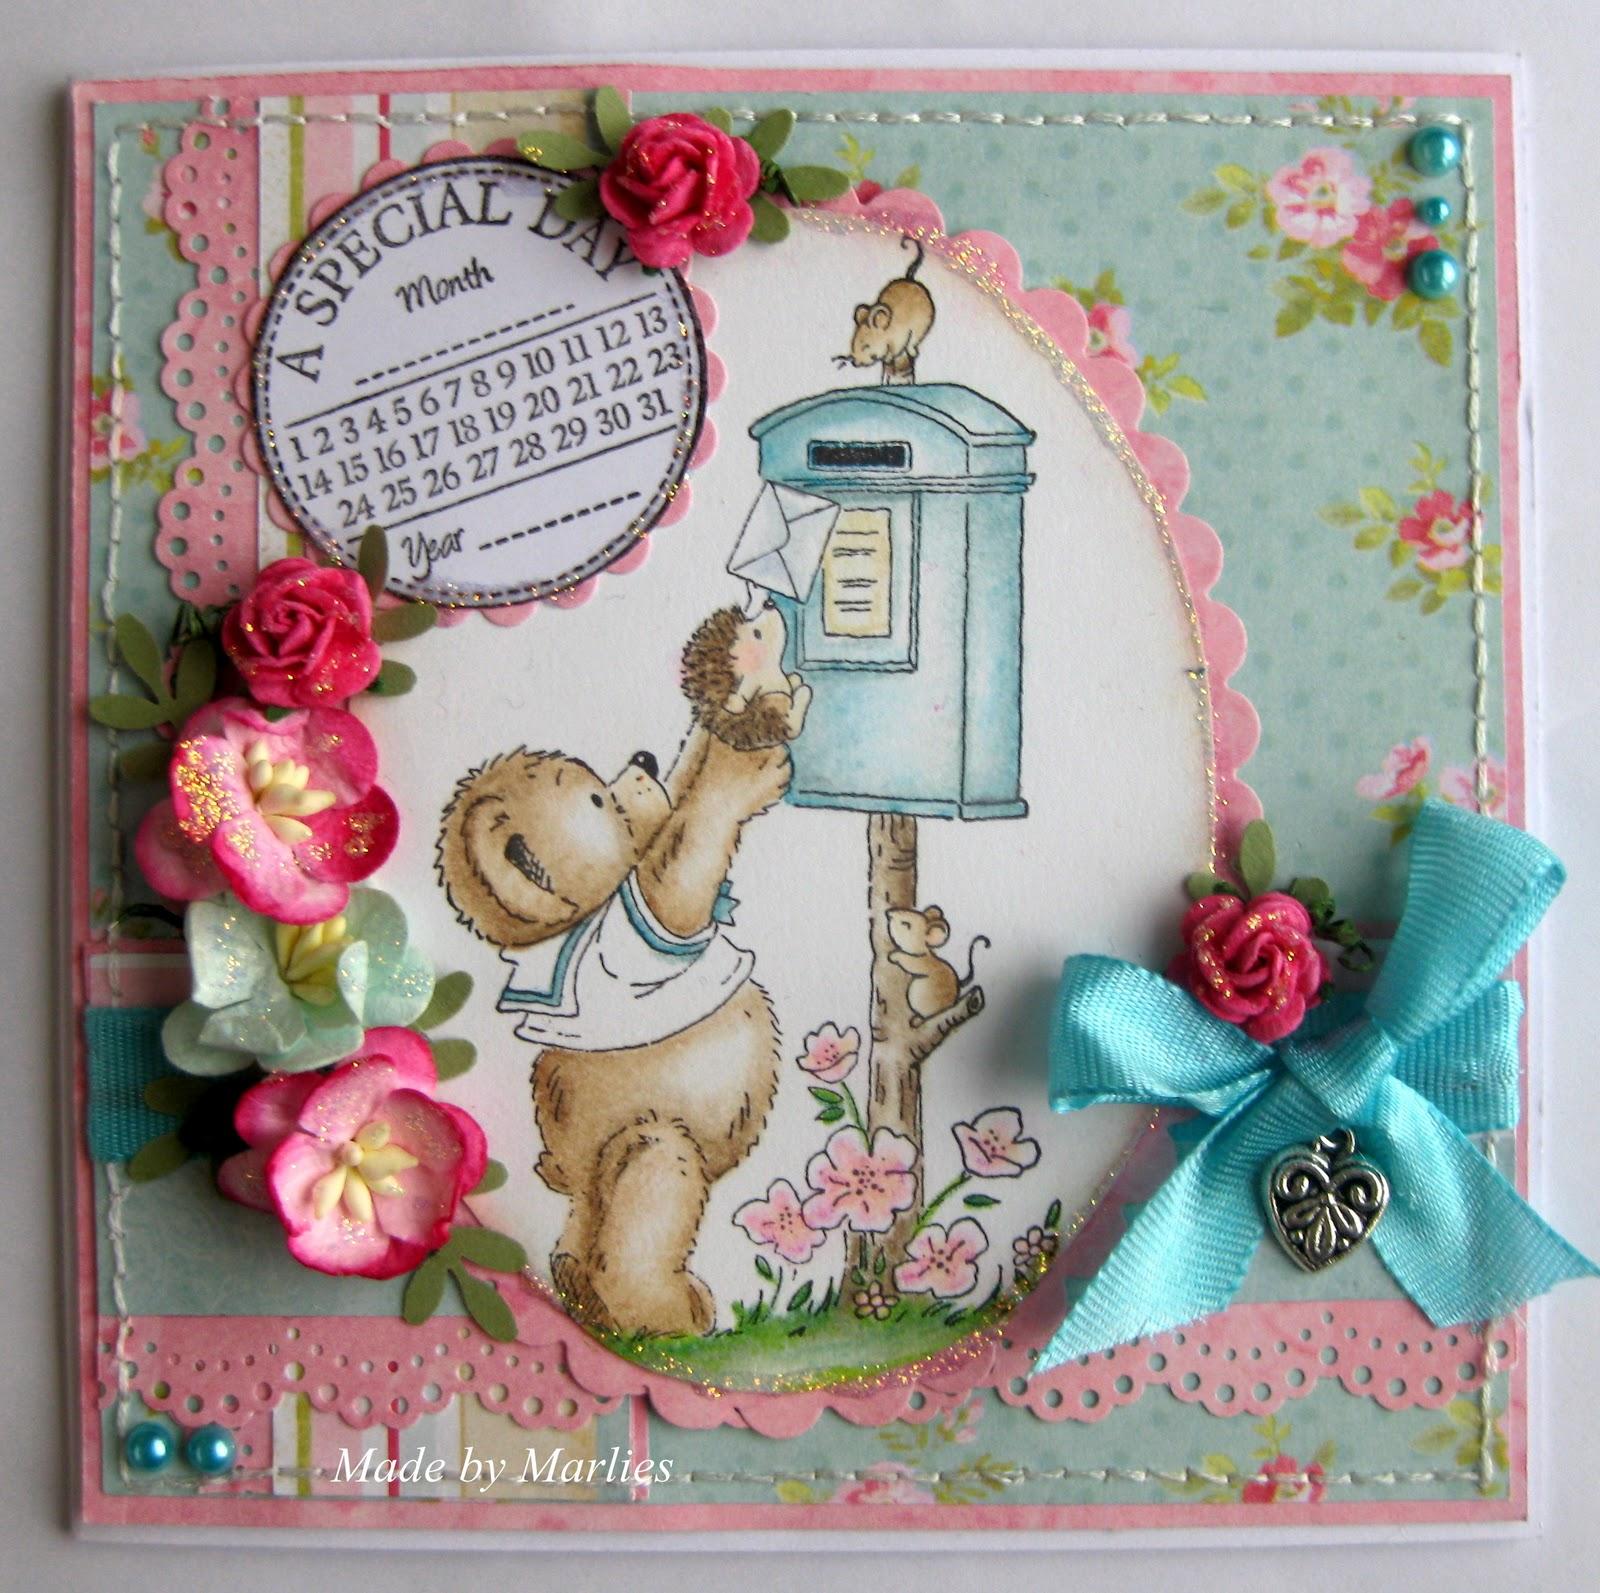 Scrapcards by marlies voor een klein meisje - Klein meisje idee ...